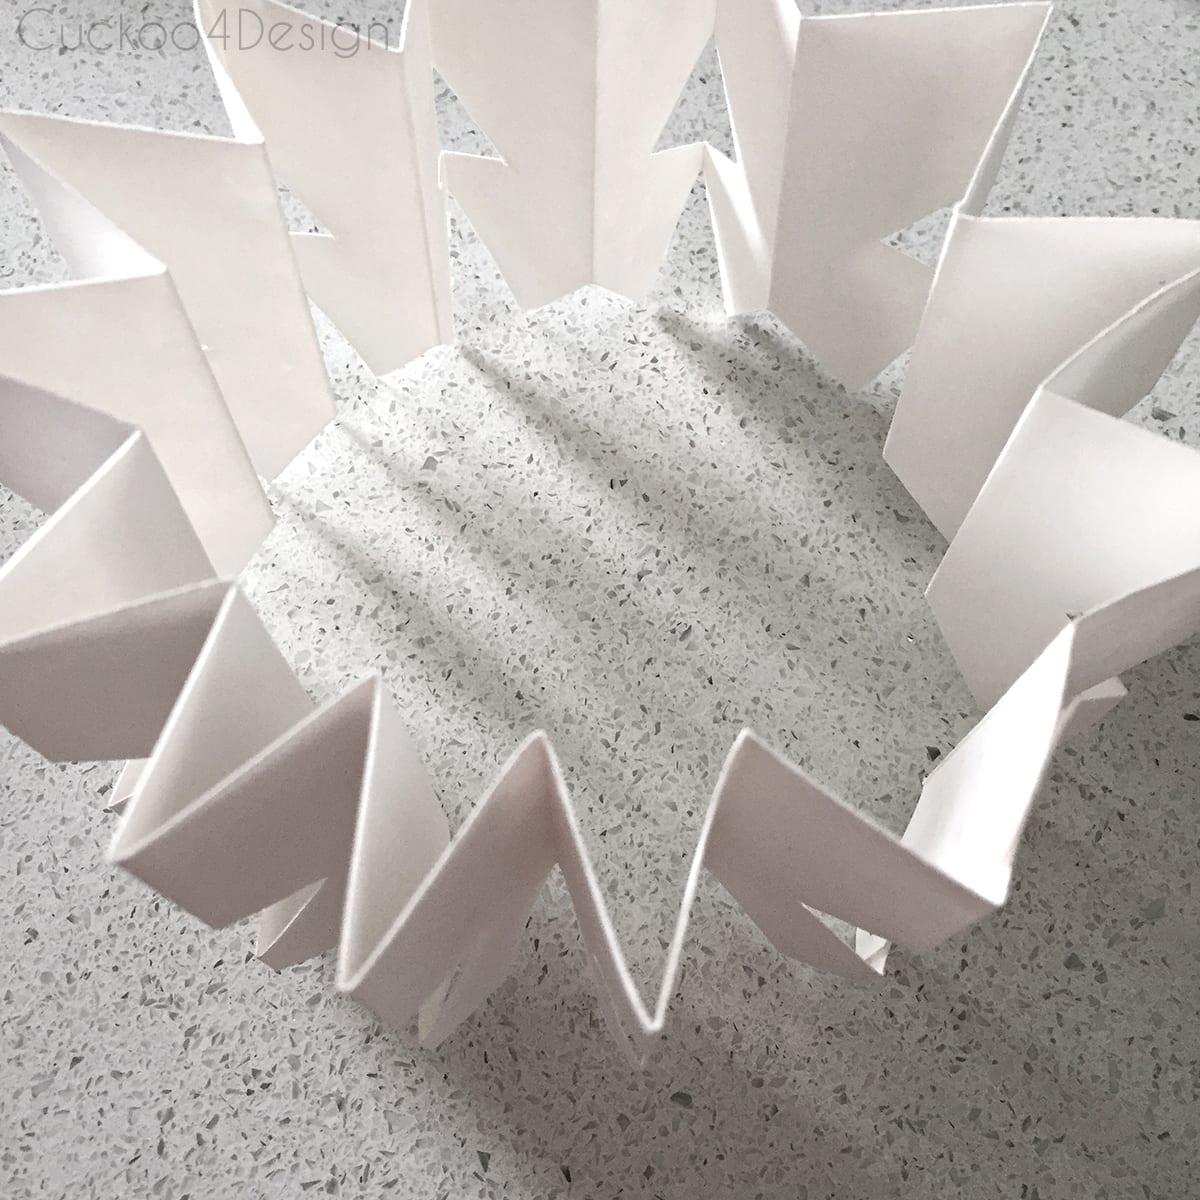 diy_snowflake_ornament_cuckoo4design_9